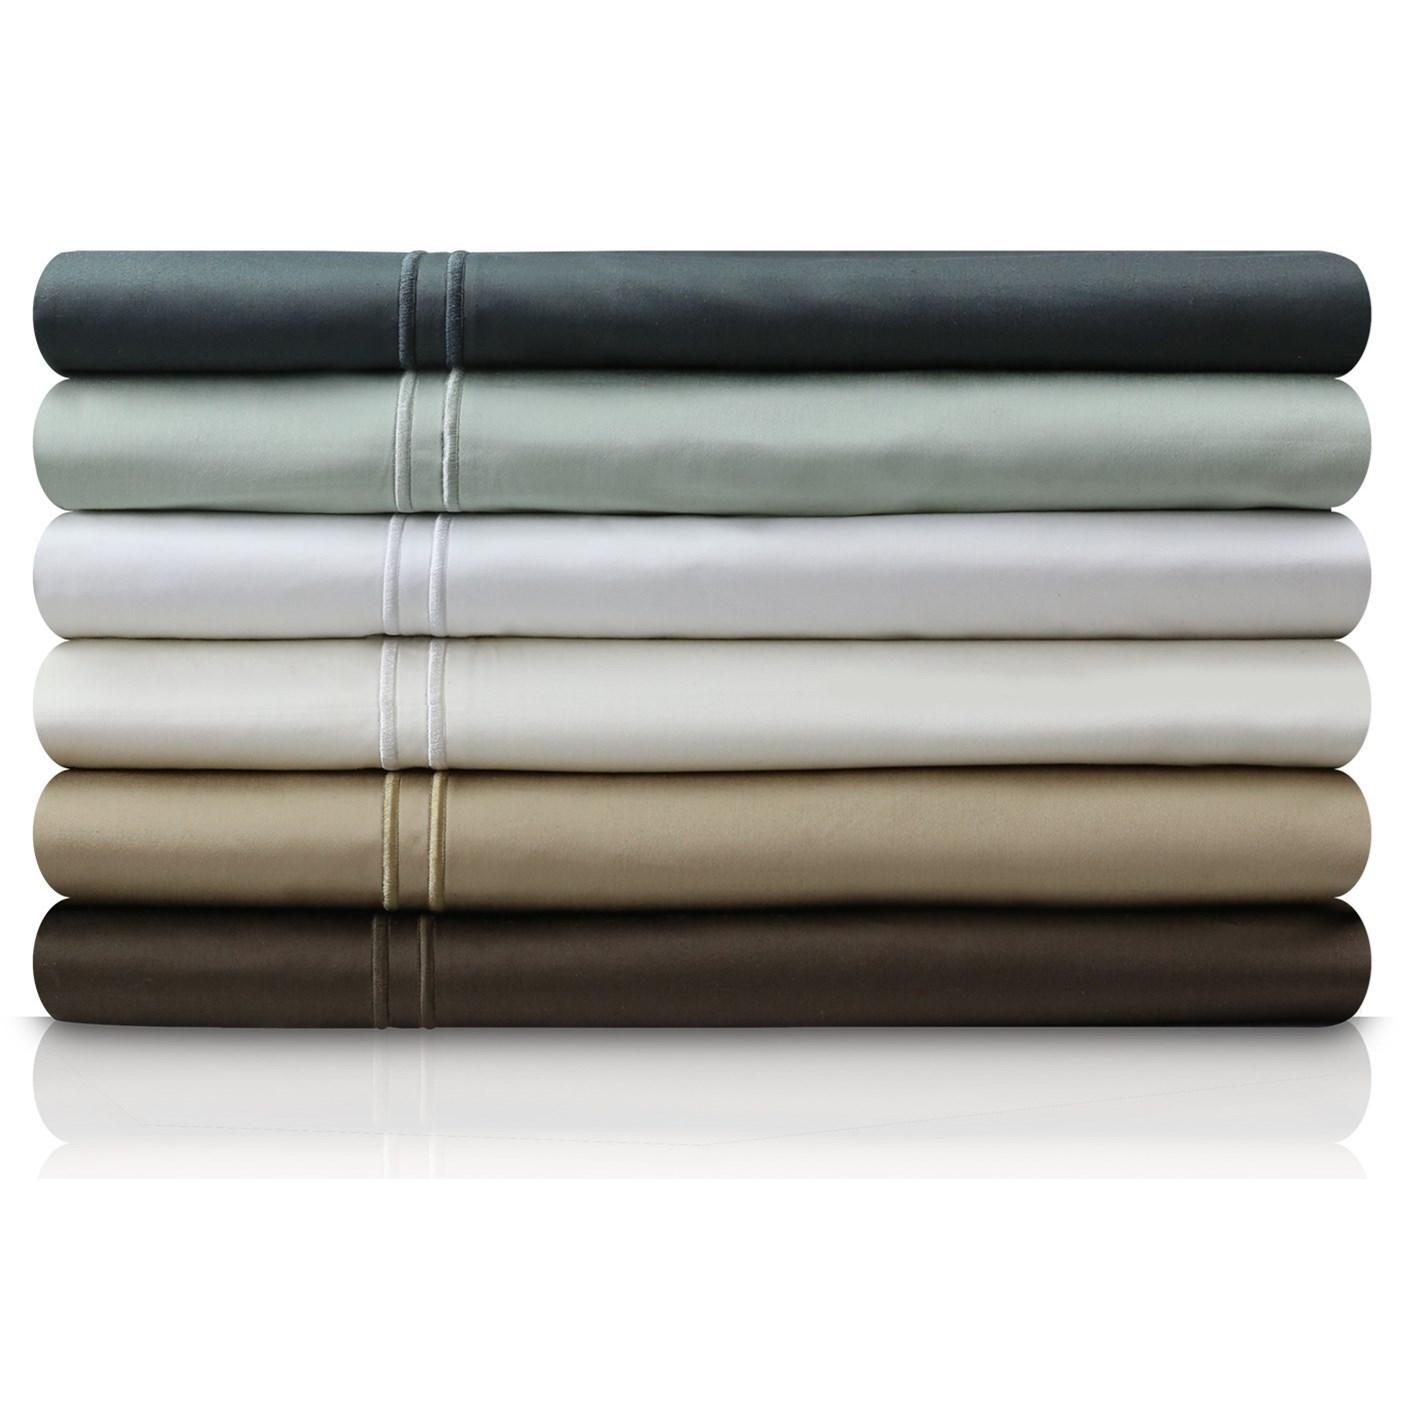 Malouf Egyptian Cotton Full 600 TC Egyptian Cotton Sheet Set - Item Number: MA06FFKHSS